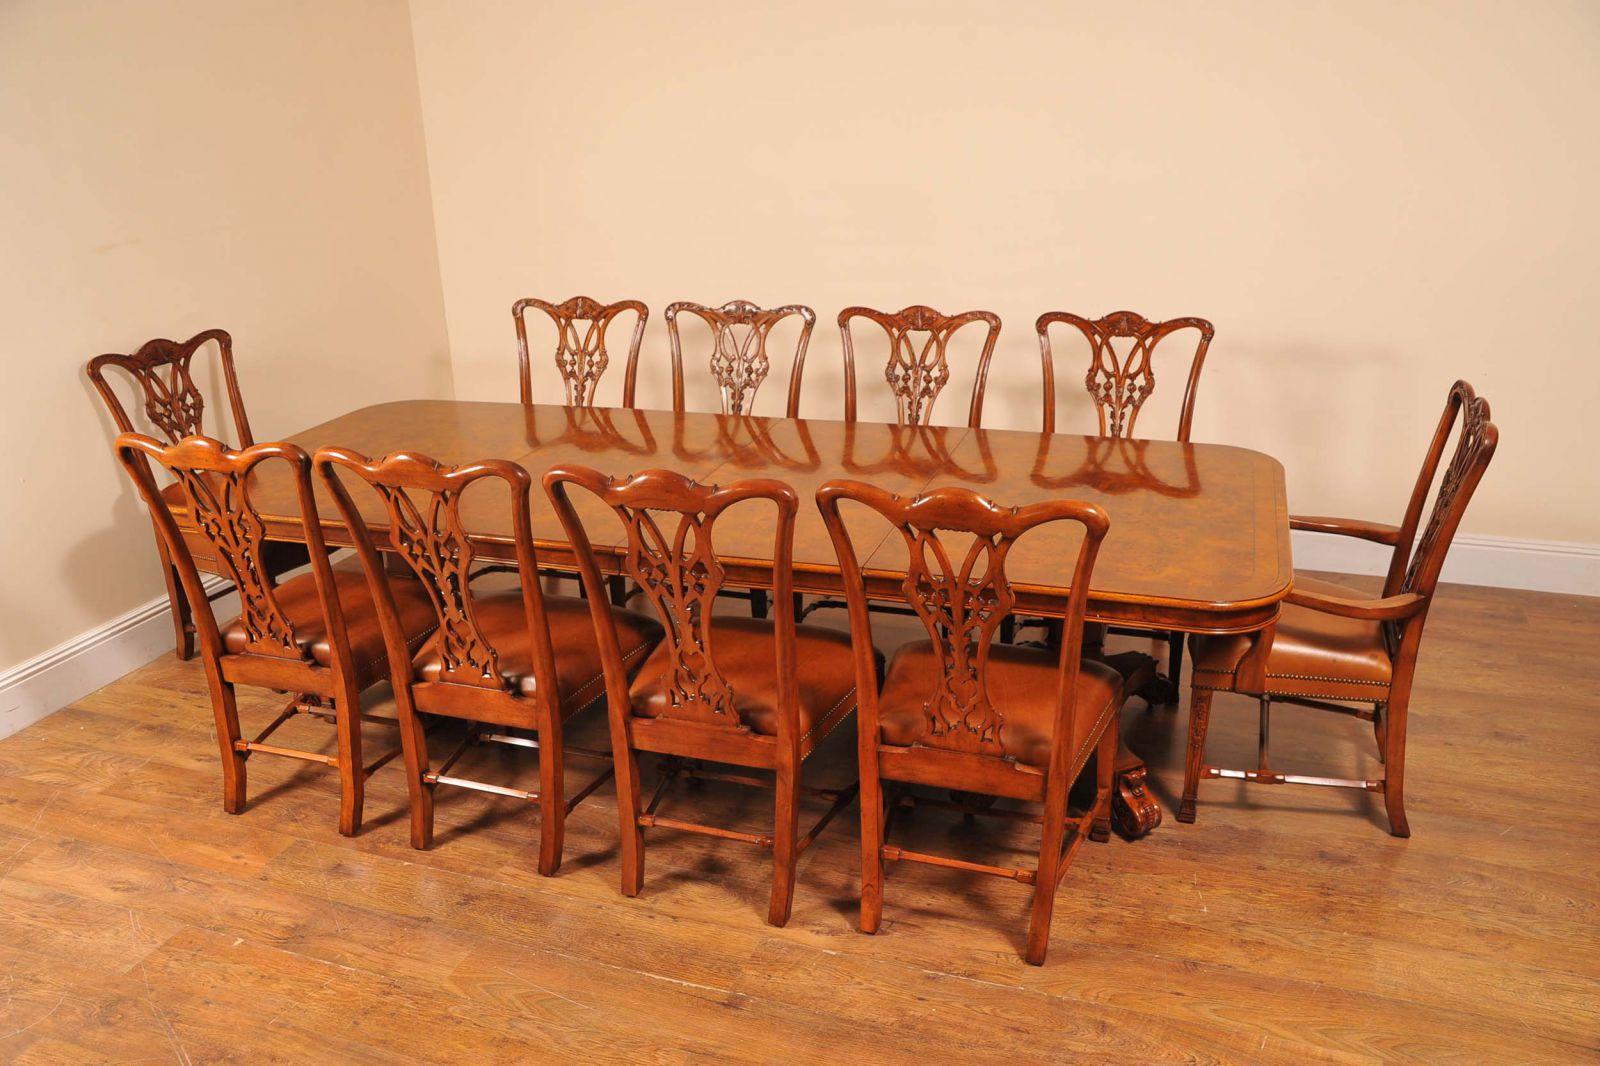 Antique Dining Set - Regency Table Chippendale Chairs www_canonburyantiques_com (1)